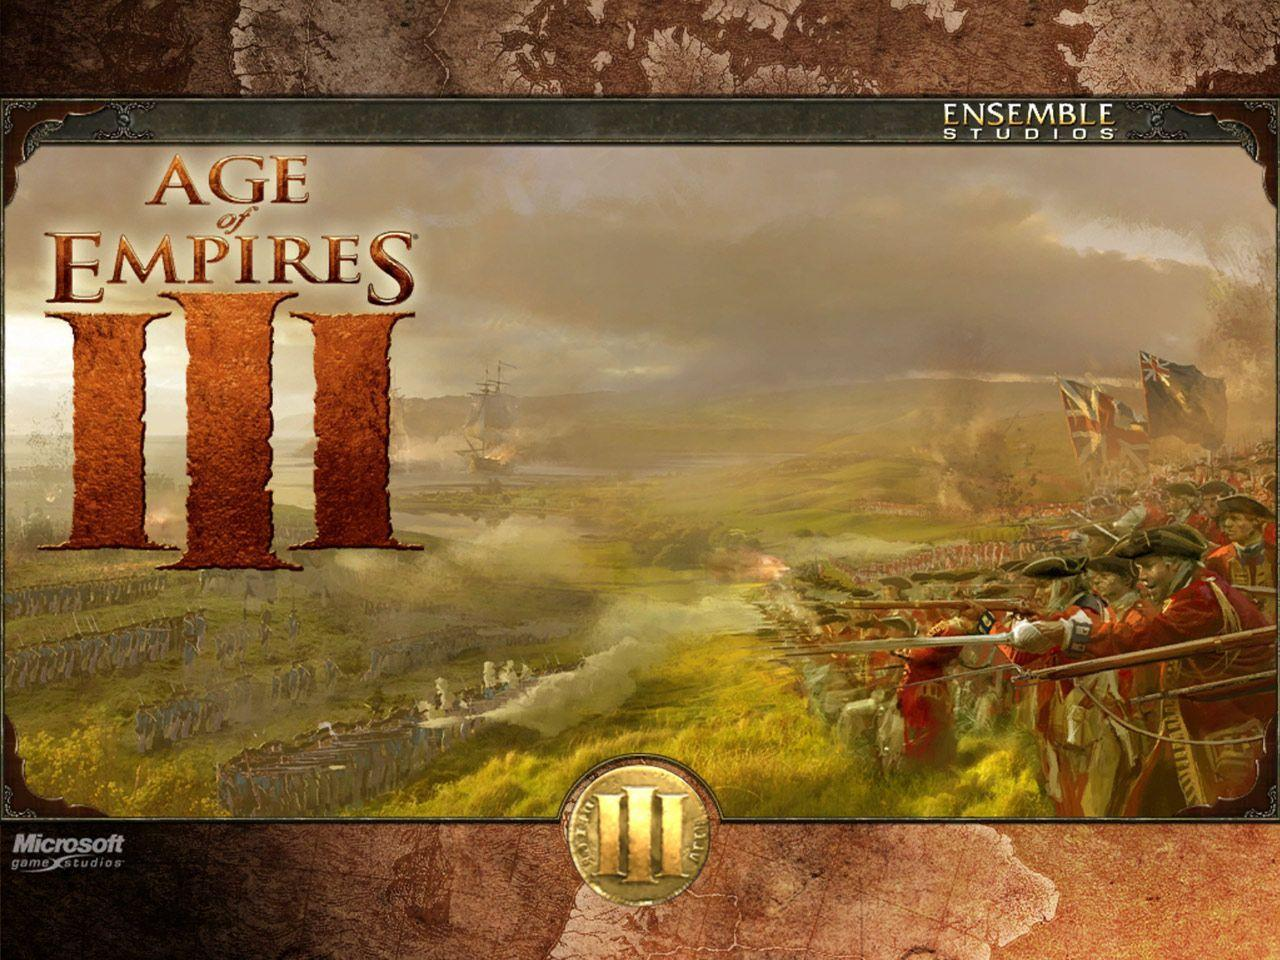 Age of Empires II < Games < Entertainment < Desktop Wallpaper